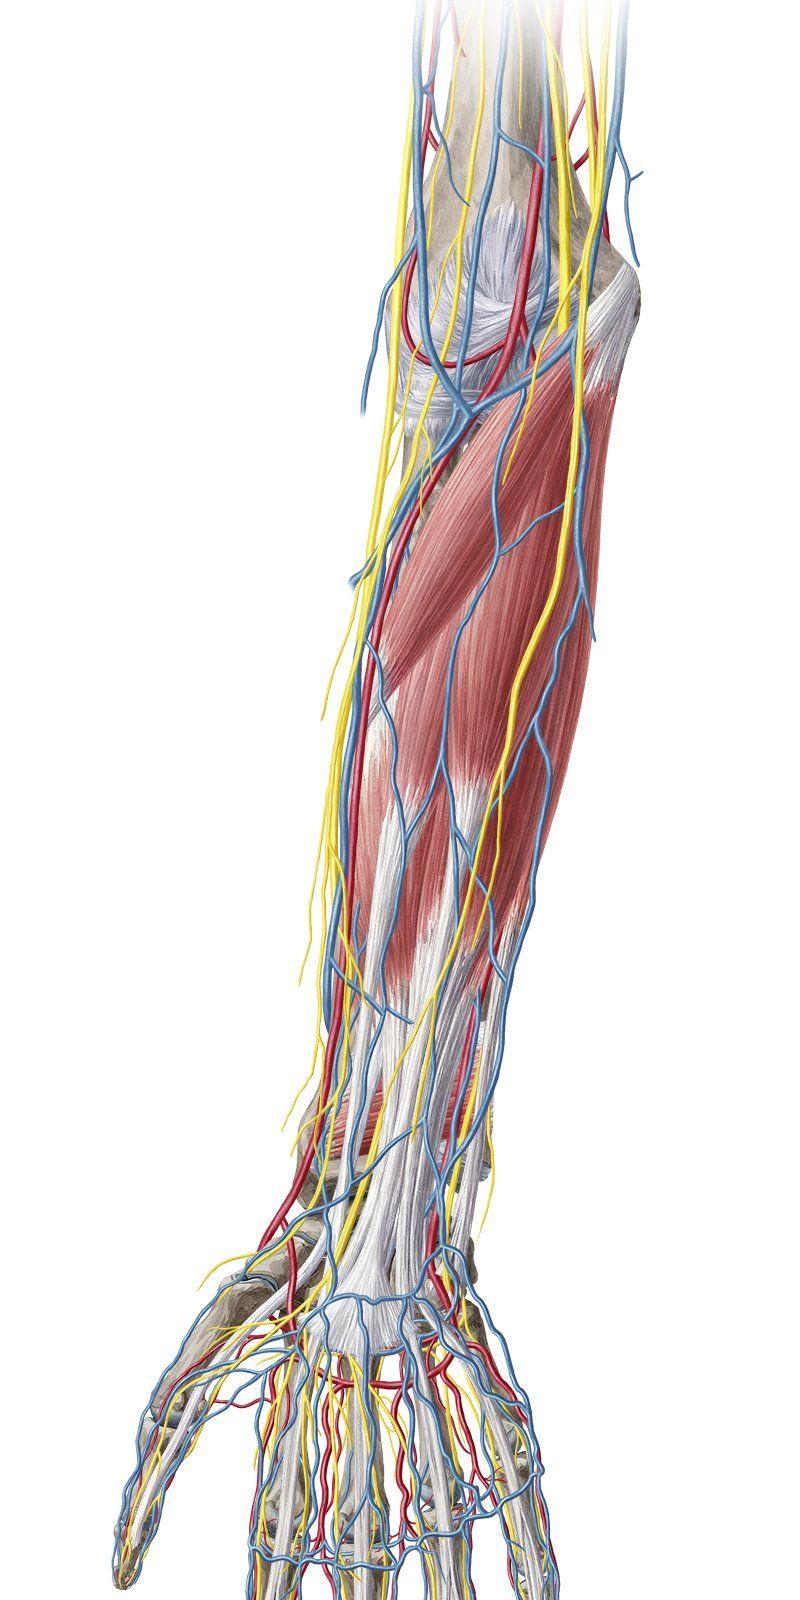 Elbow and forearm   Forearm anatomy, Anatomy study, Bones ...